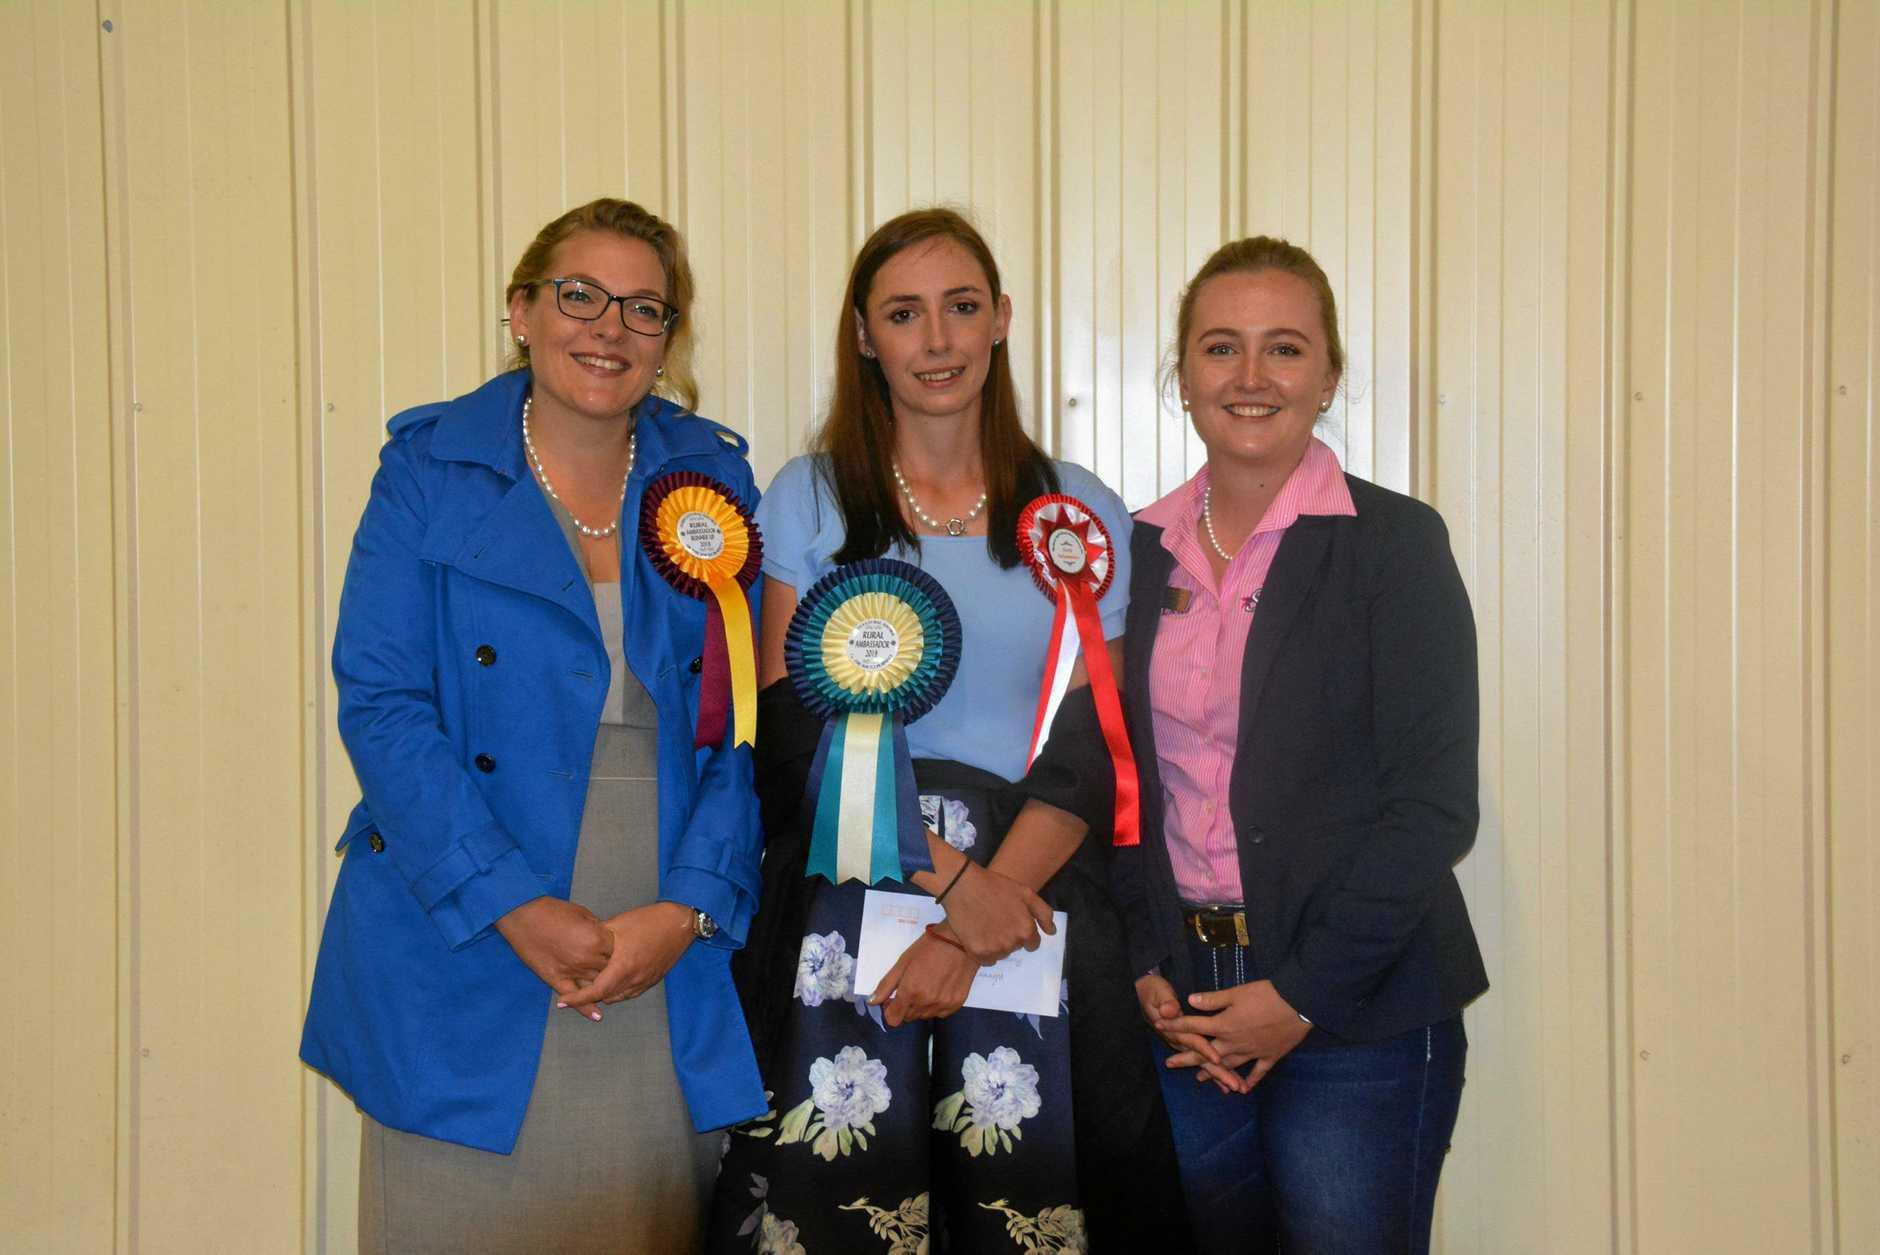 Rural Ambassador; Stacey Sanders (Nanango), Runner Up Brigitta Knopke (Kingaroy), and Winner Leonie Nichols (Blackbutt).